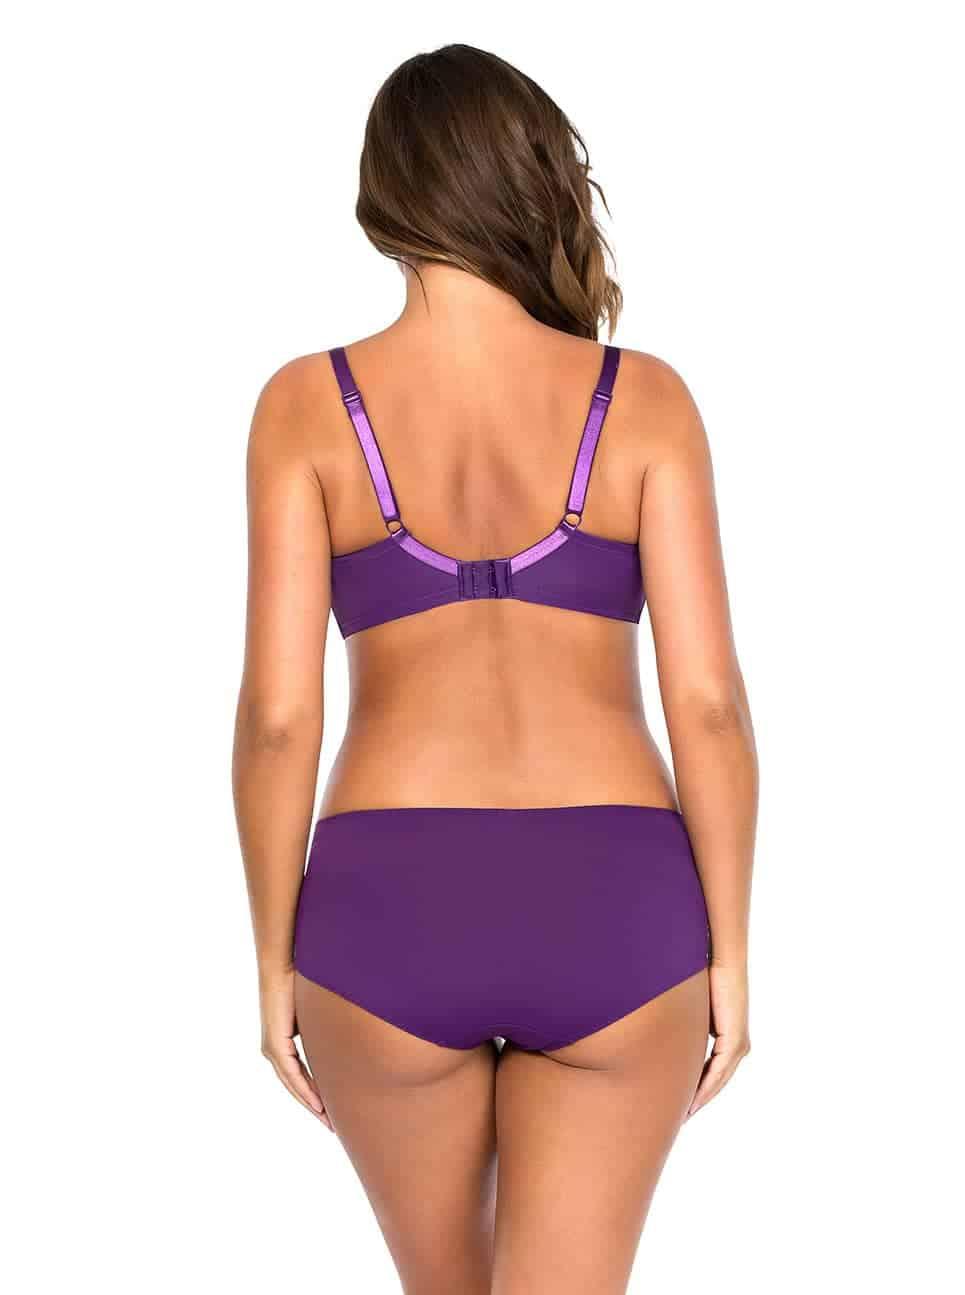 Carole WireBra3102 Hipster3105 Imperial Purple Back 2 - Carole Wire Bra - Imperial Purple - 3102